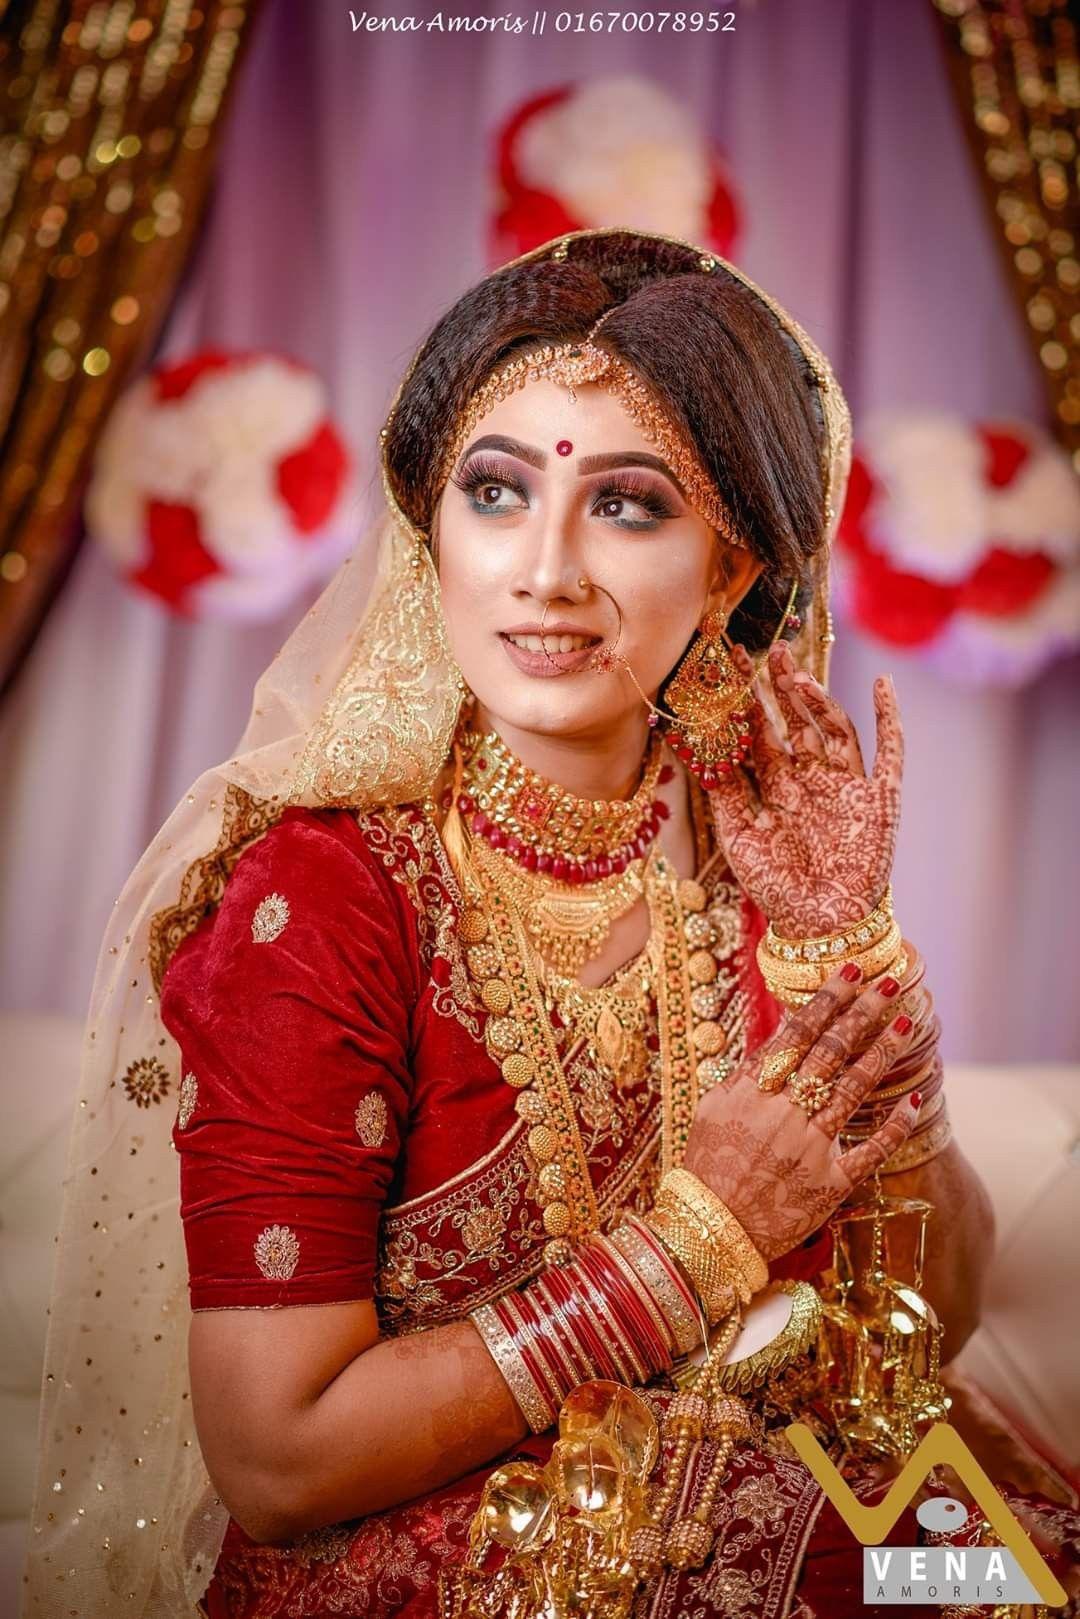 Pin by Tonima on Bangladeshi brides in 2020 Eye makeup